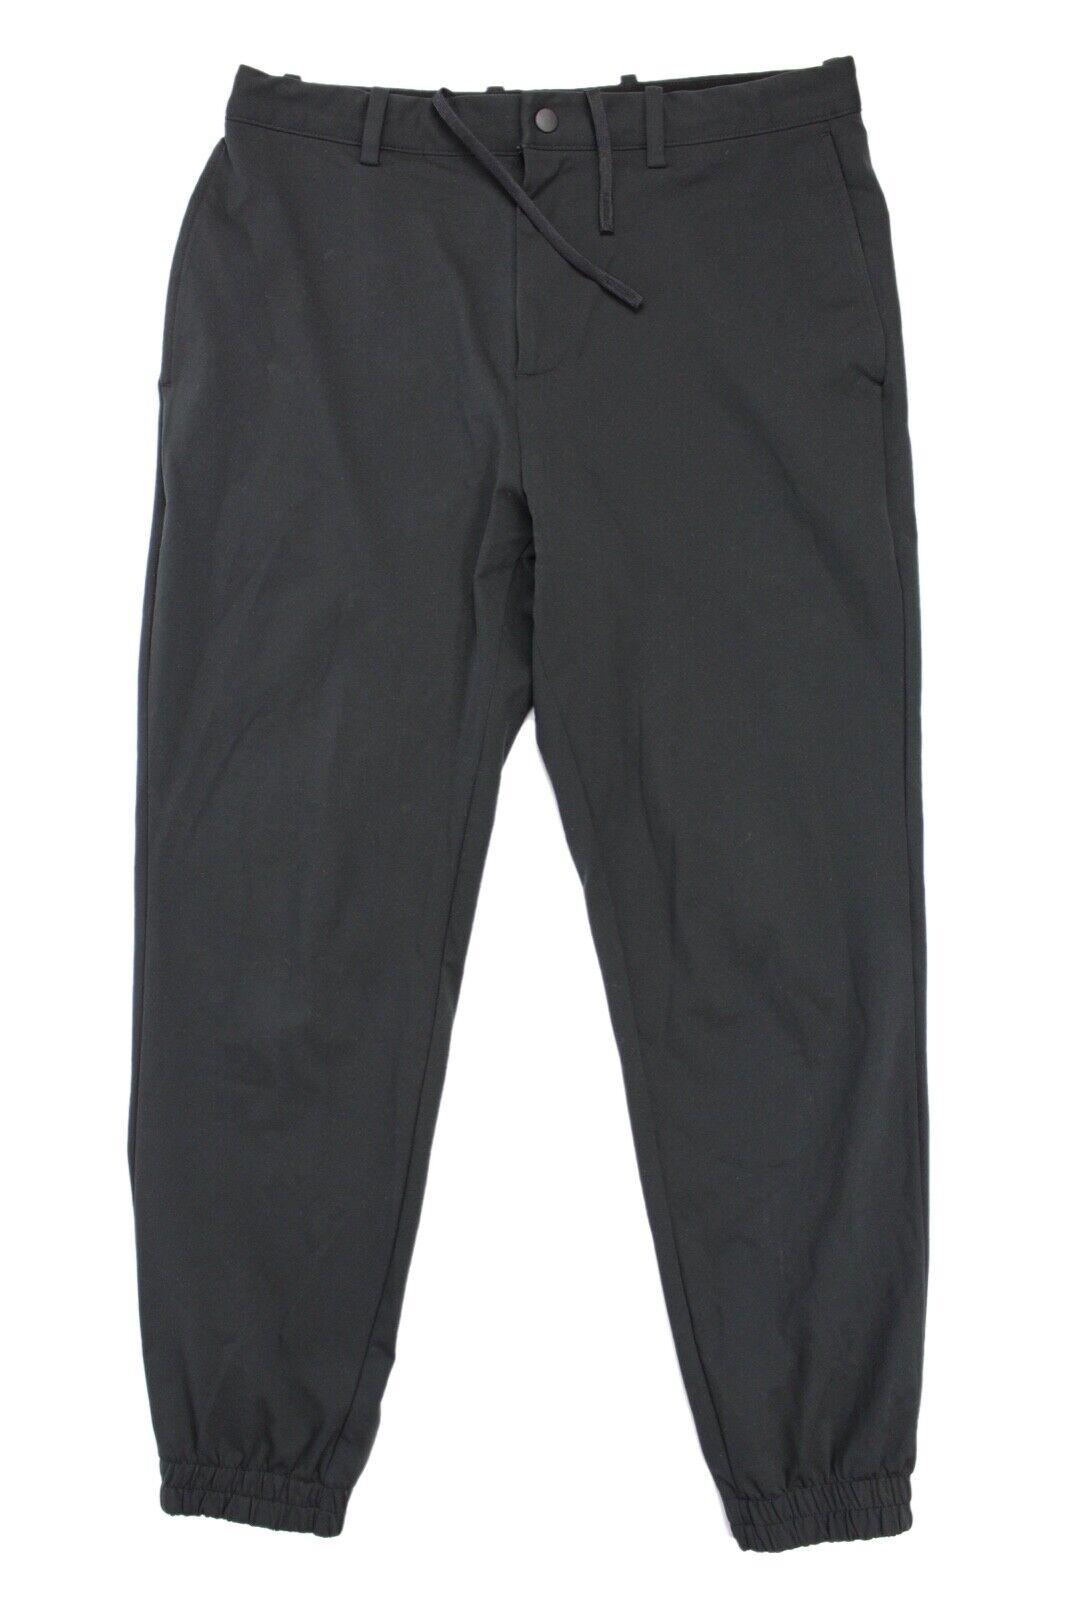 UNIQLO Stretchhose schwarz Hose Größe M